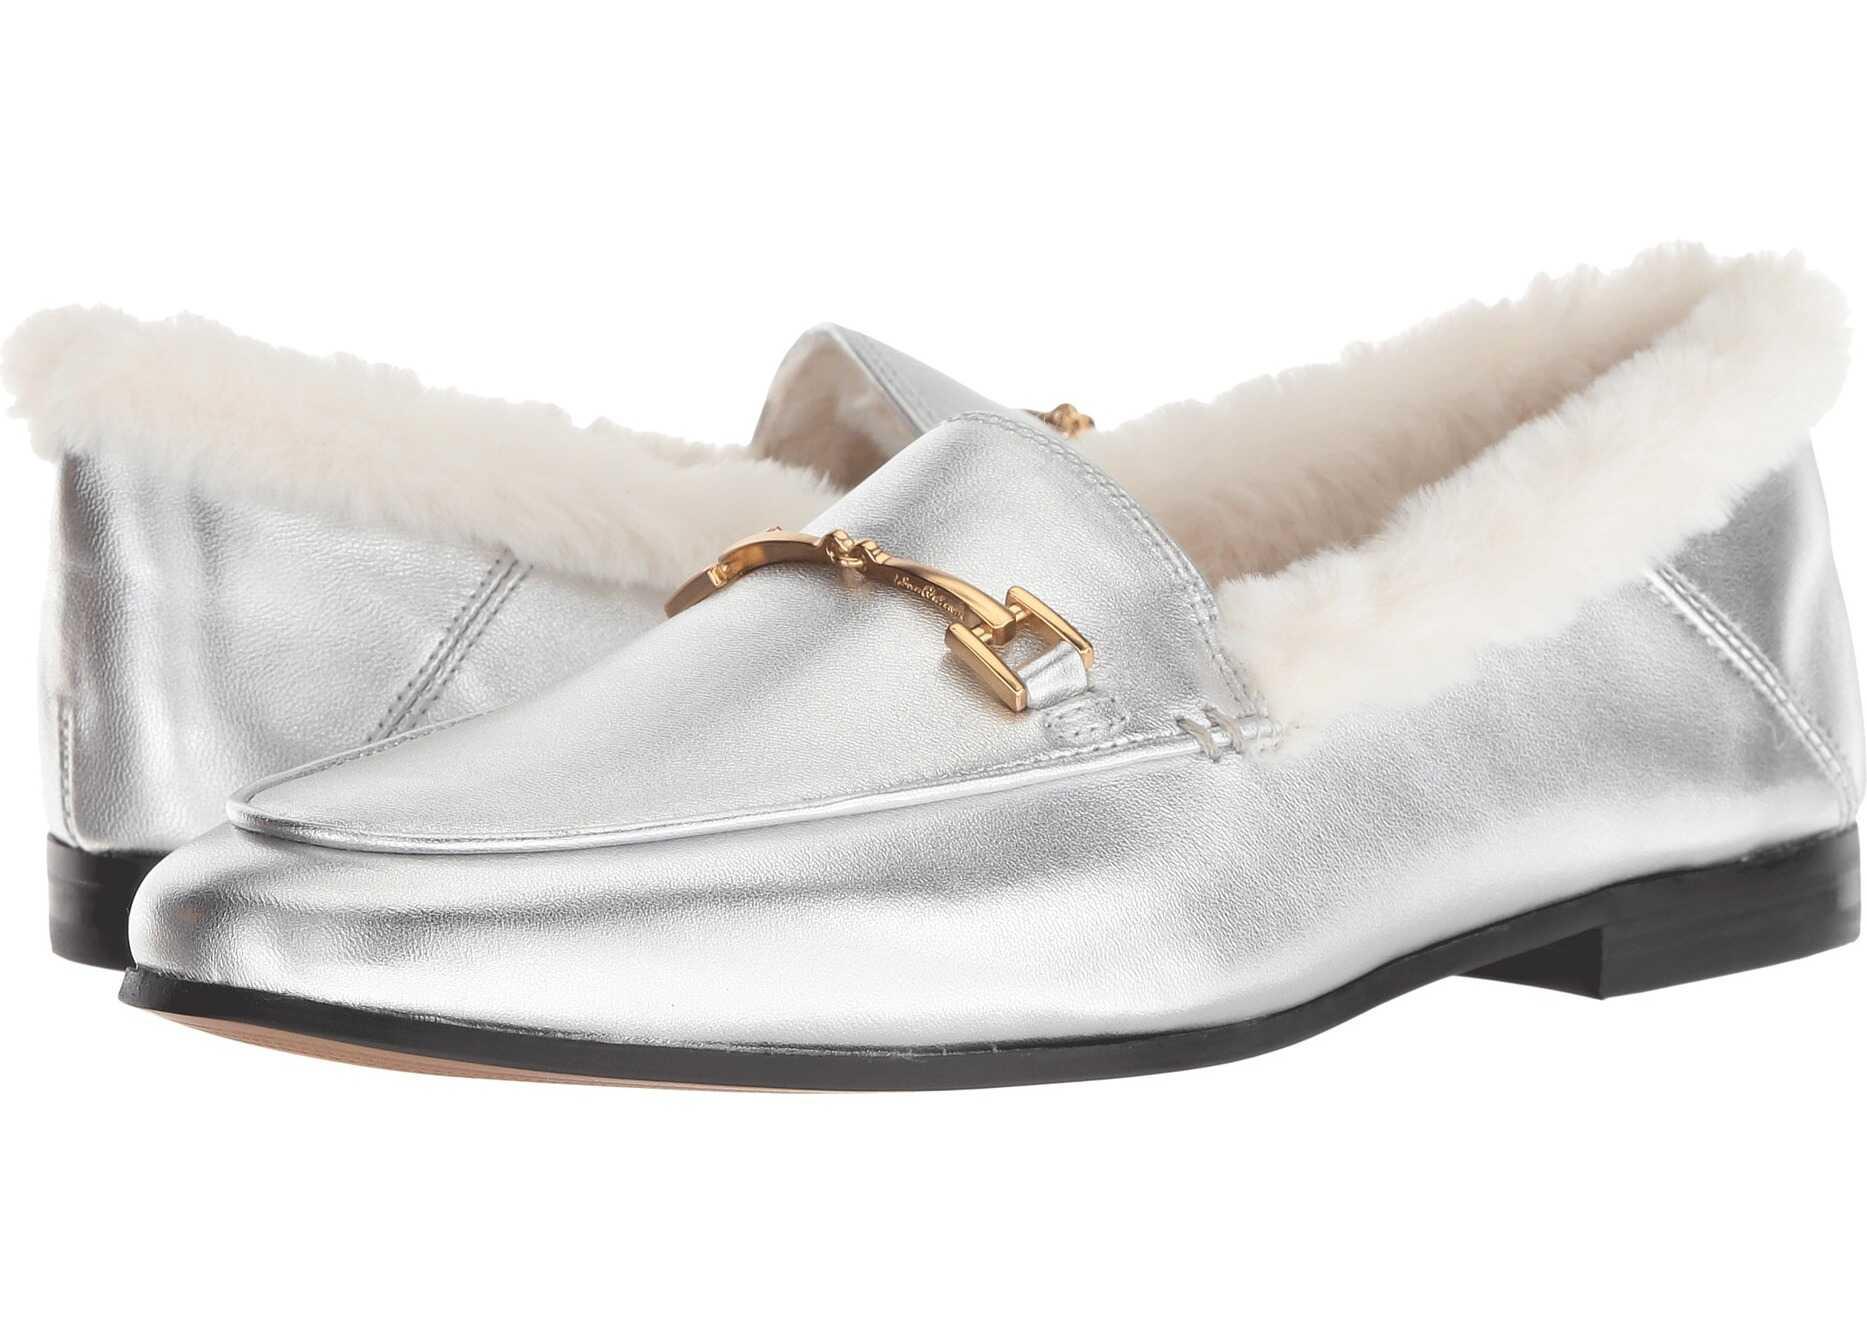 Sam Edelman Loraine Soft Silver/Modern Ivory Soft Metallic Sheep Leather/Short Plush